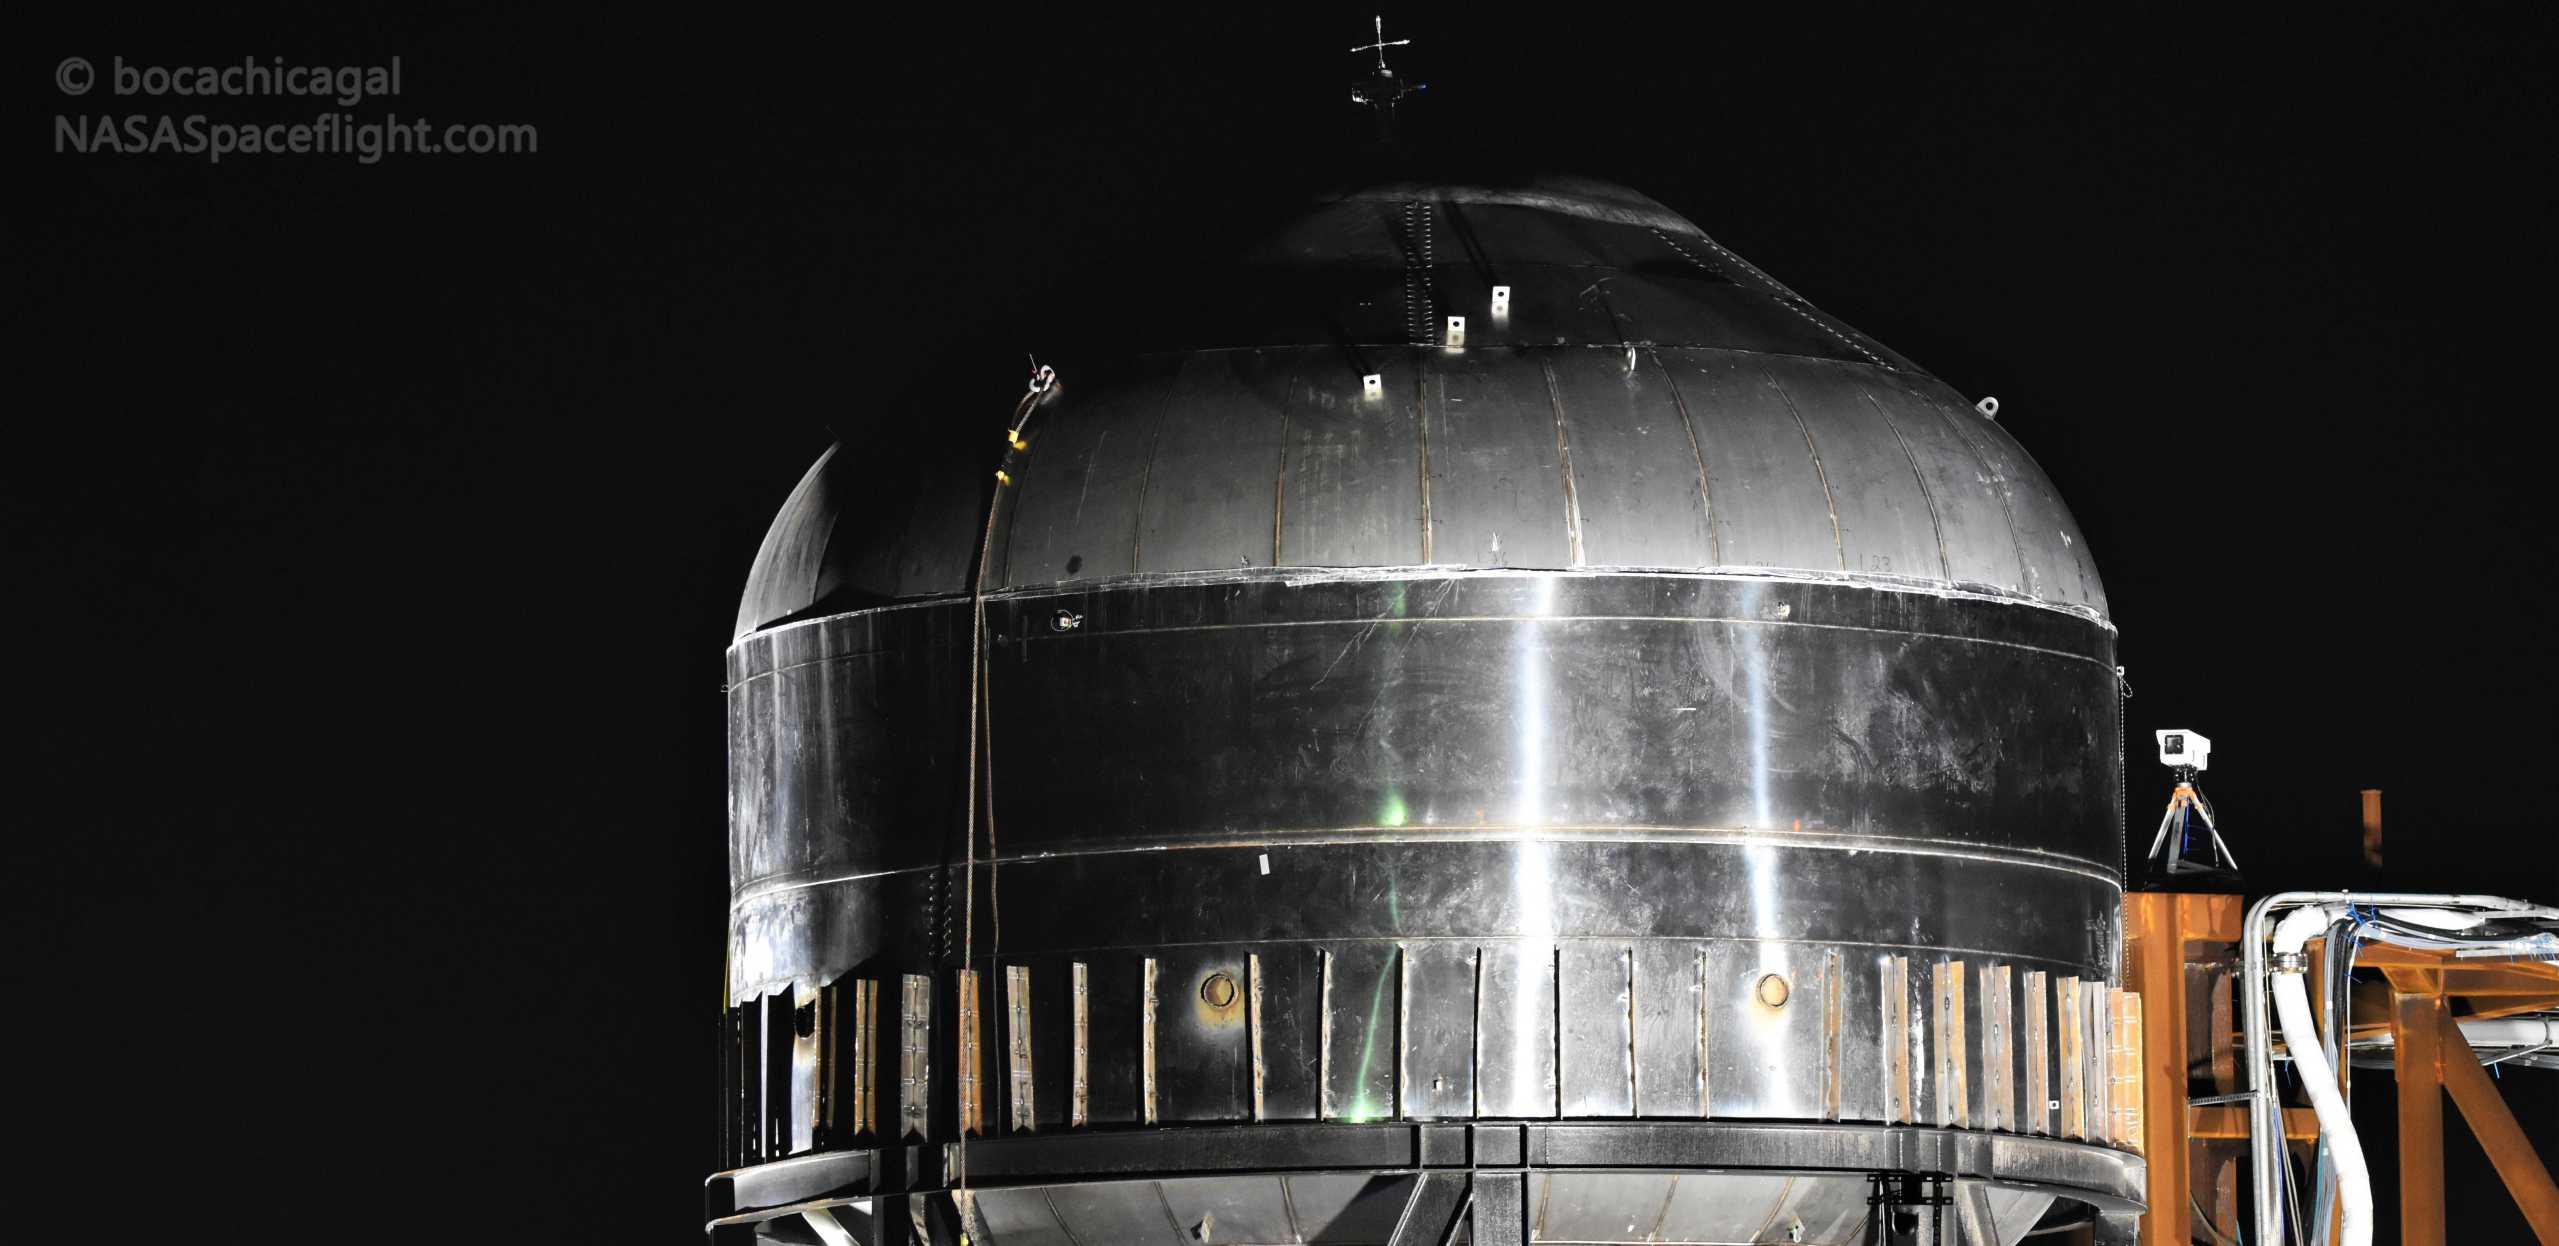 Starship Boca Chica 011020 (NASASpaceflight – bocachicagal) tesk tank prep 1 crop (c)